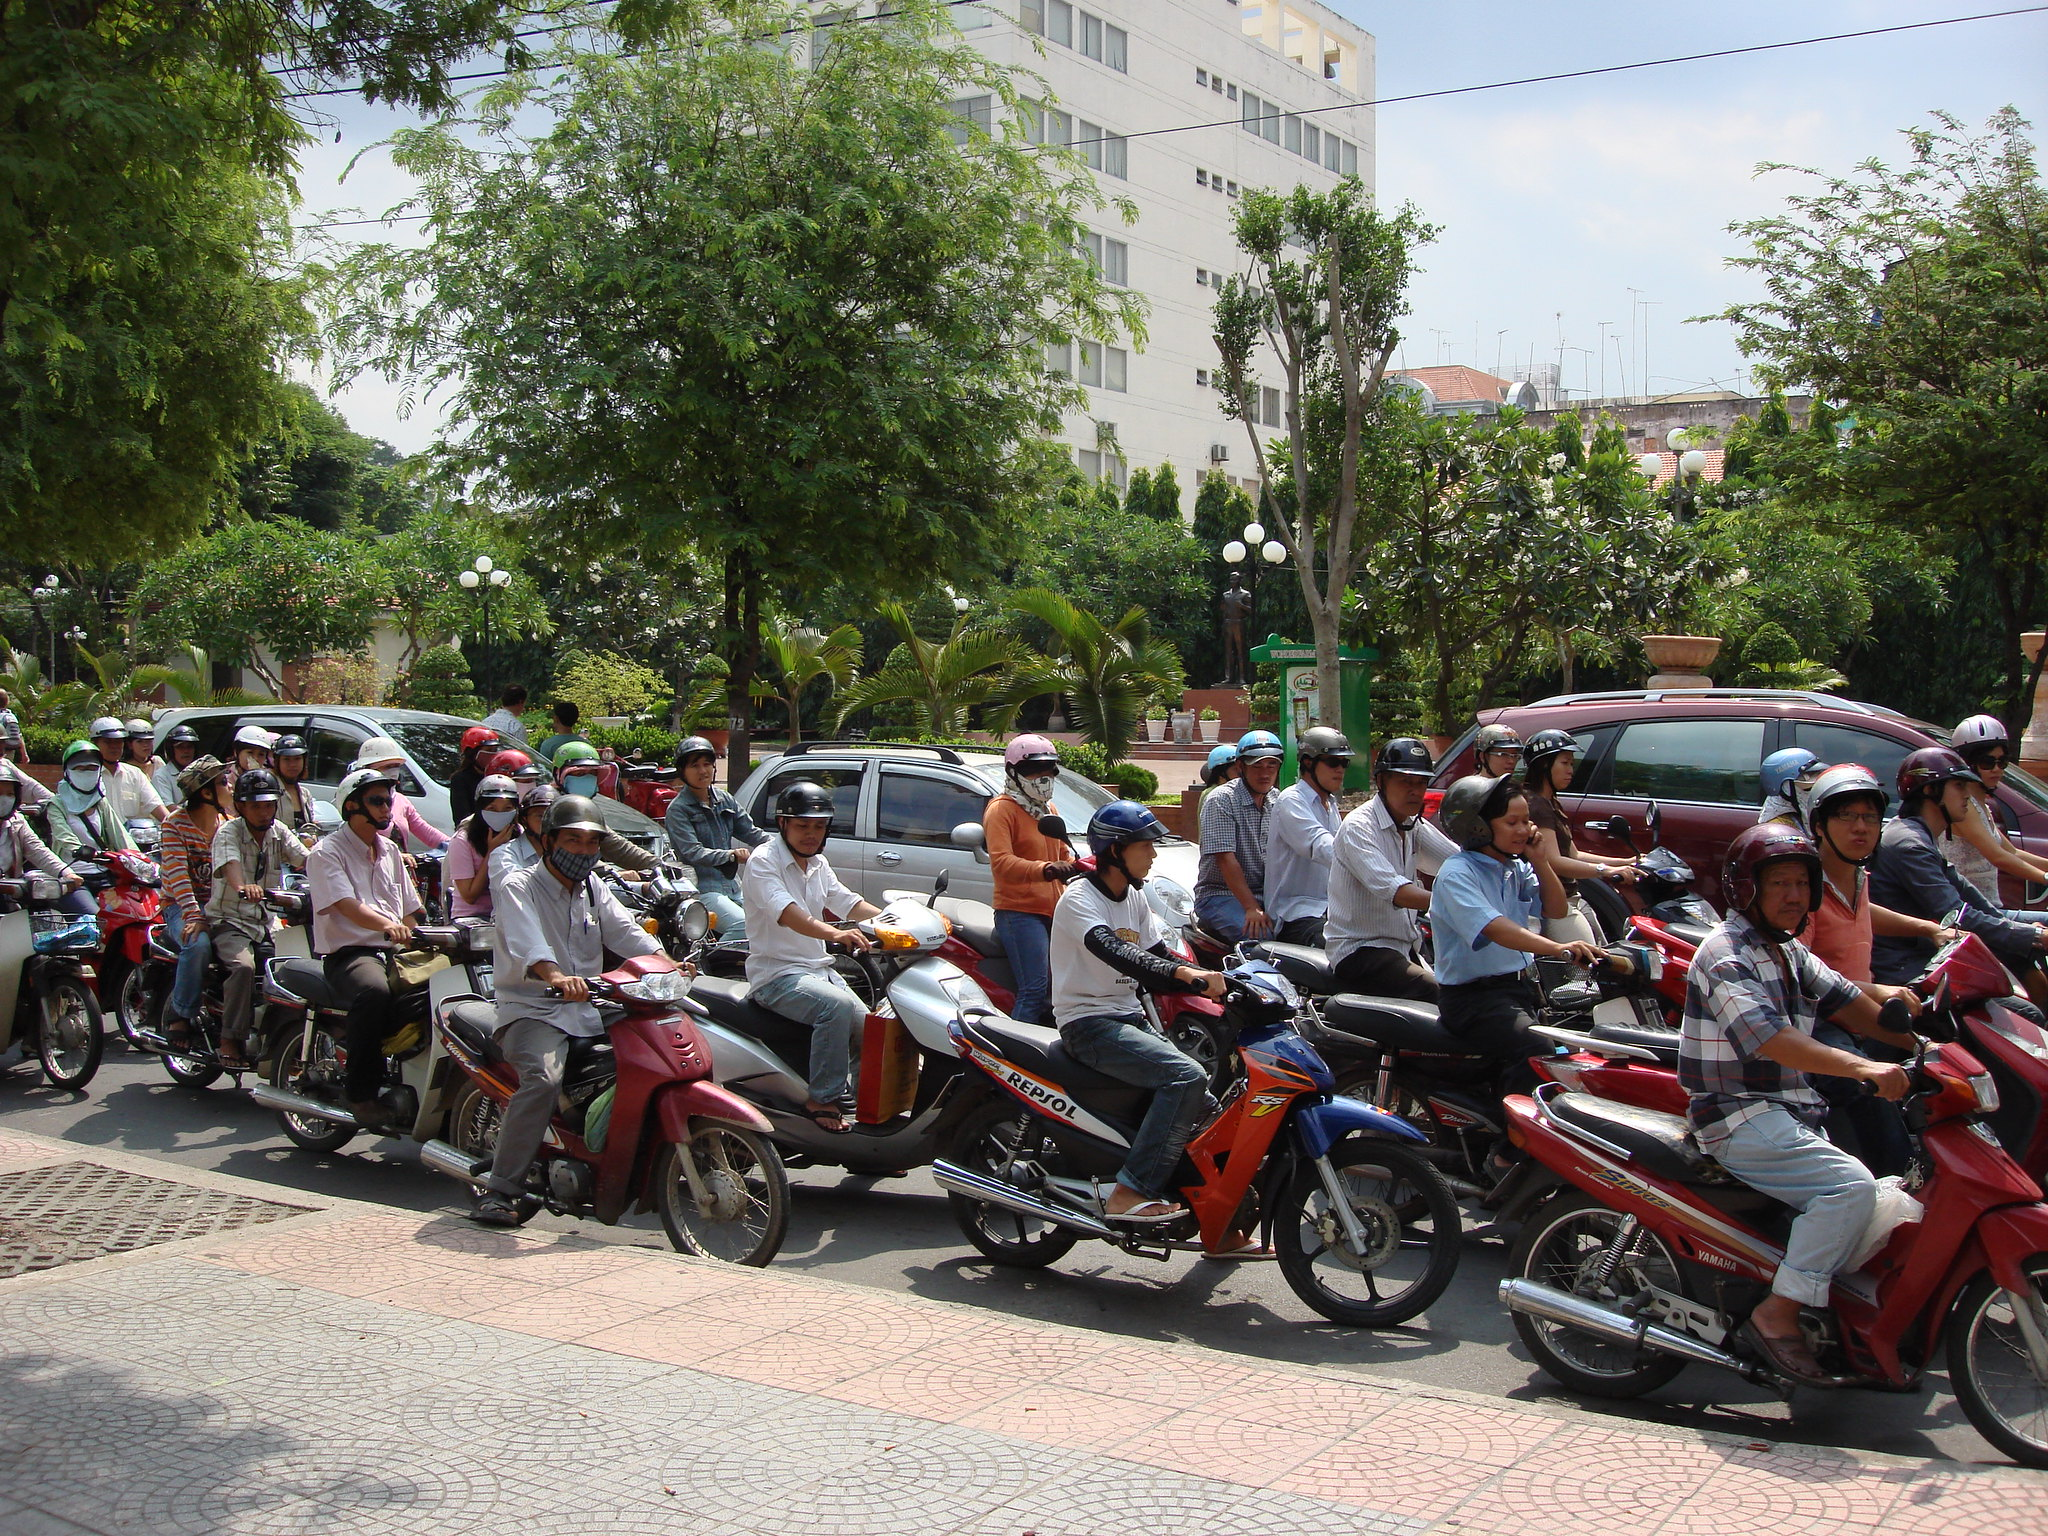 Walkthrough Crazily Chaotic Six Lane Traffic In Vietnam